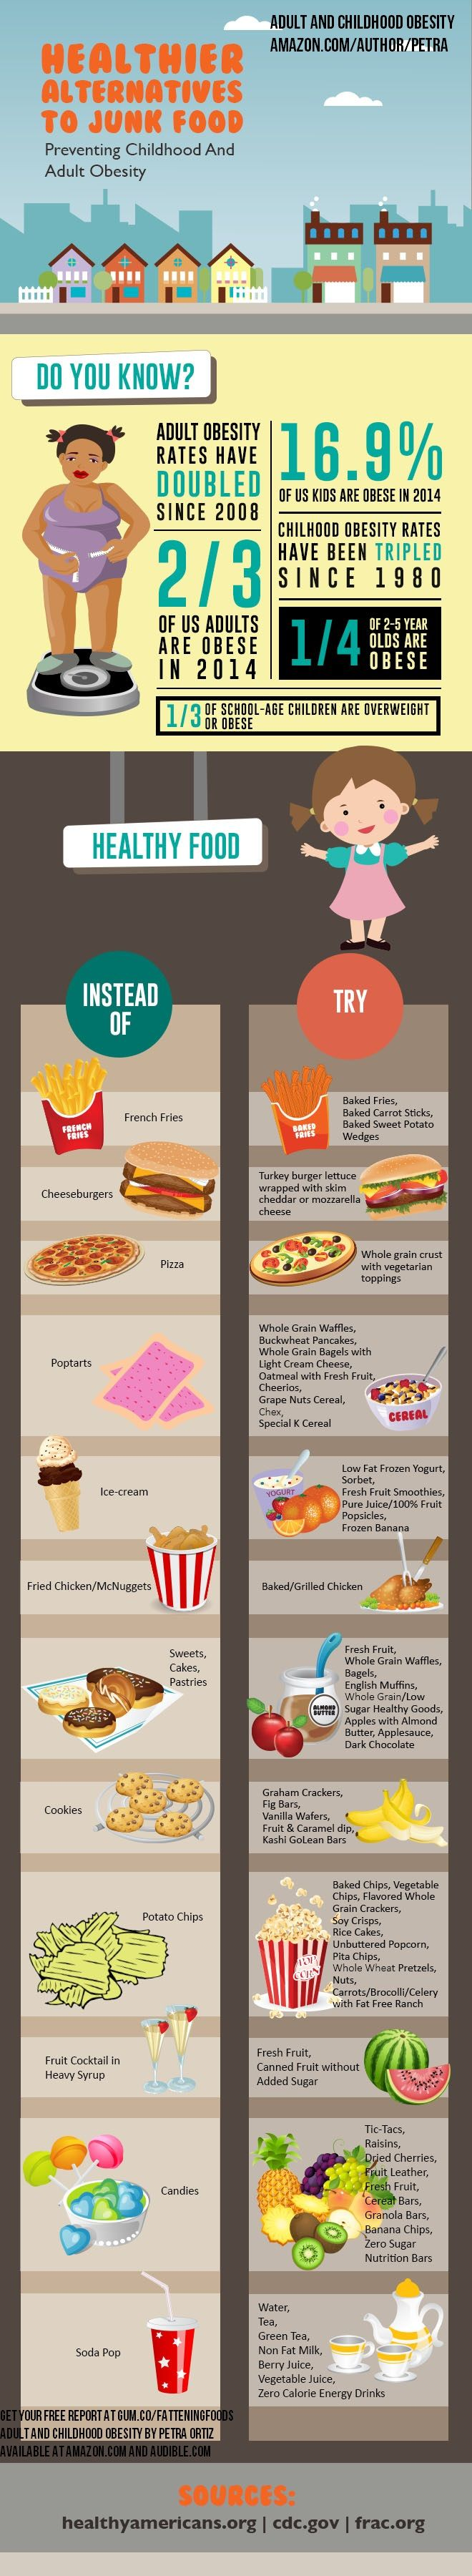 Healthy Alternatives to Junk Food